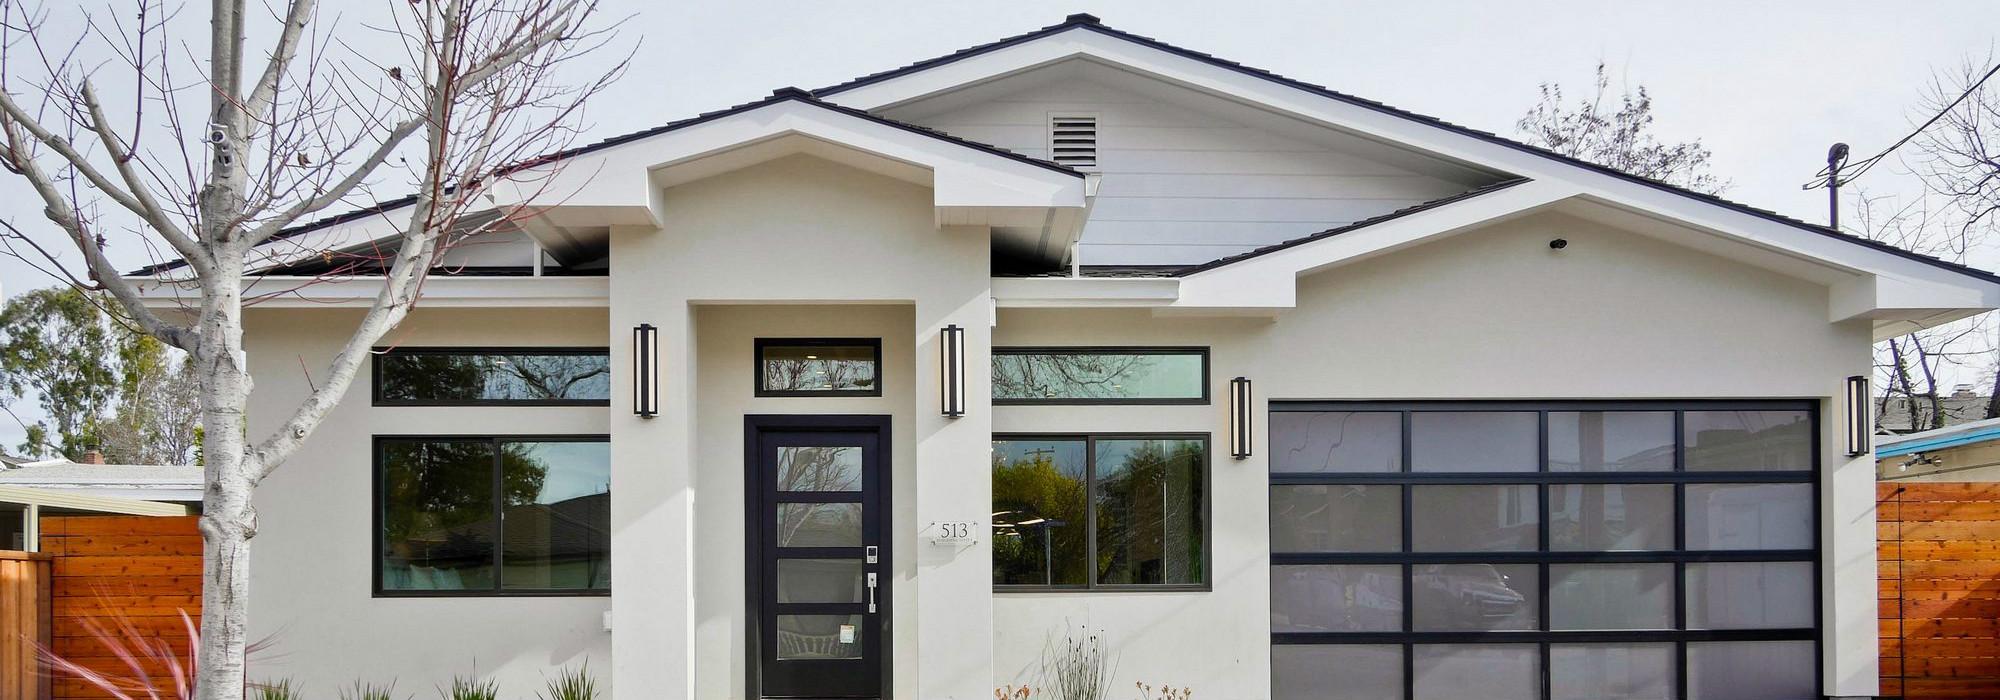 513 Burgoyne Street, Mountain View, CA 94043